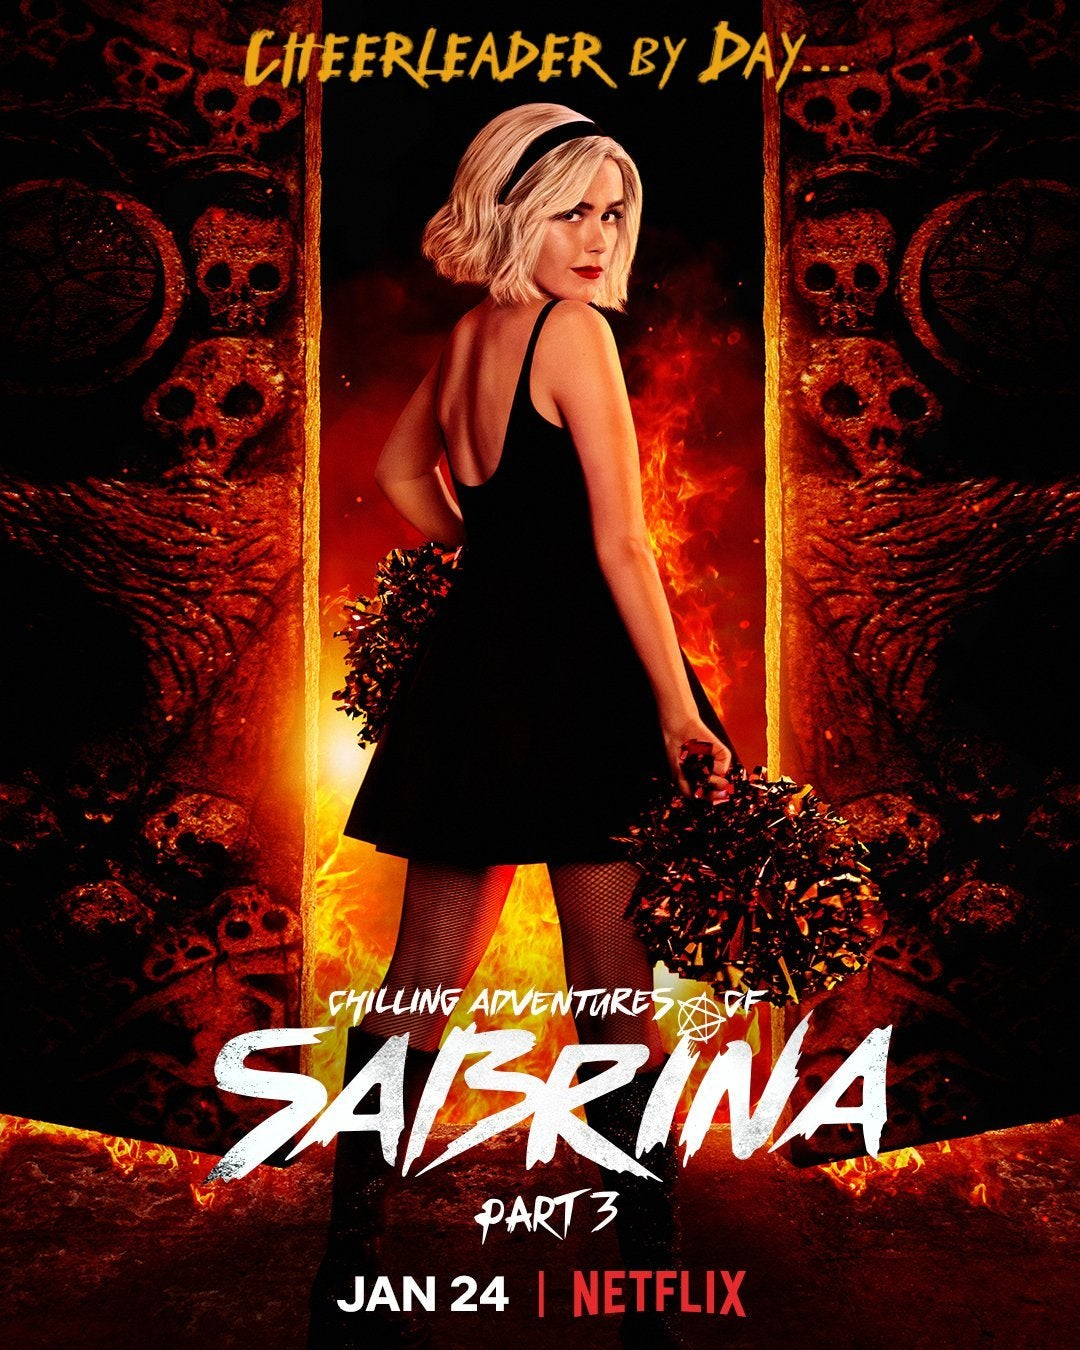 chilling adventures of sabrina poster part 3 kiernan shipka